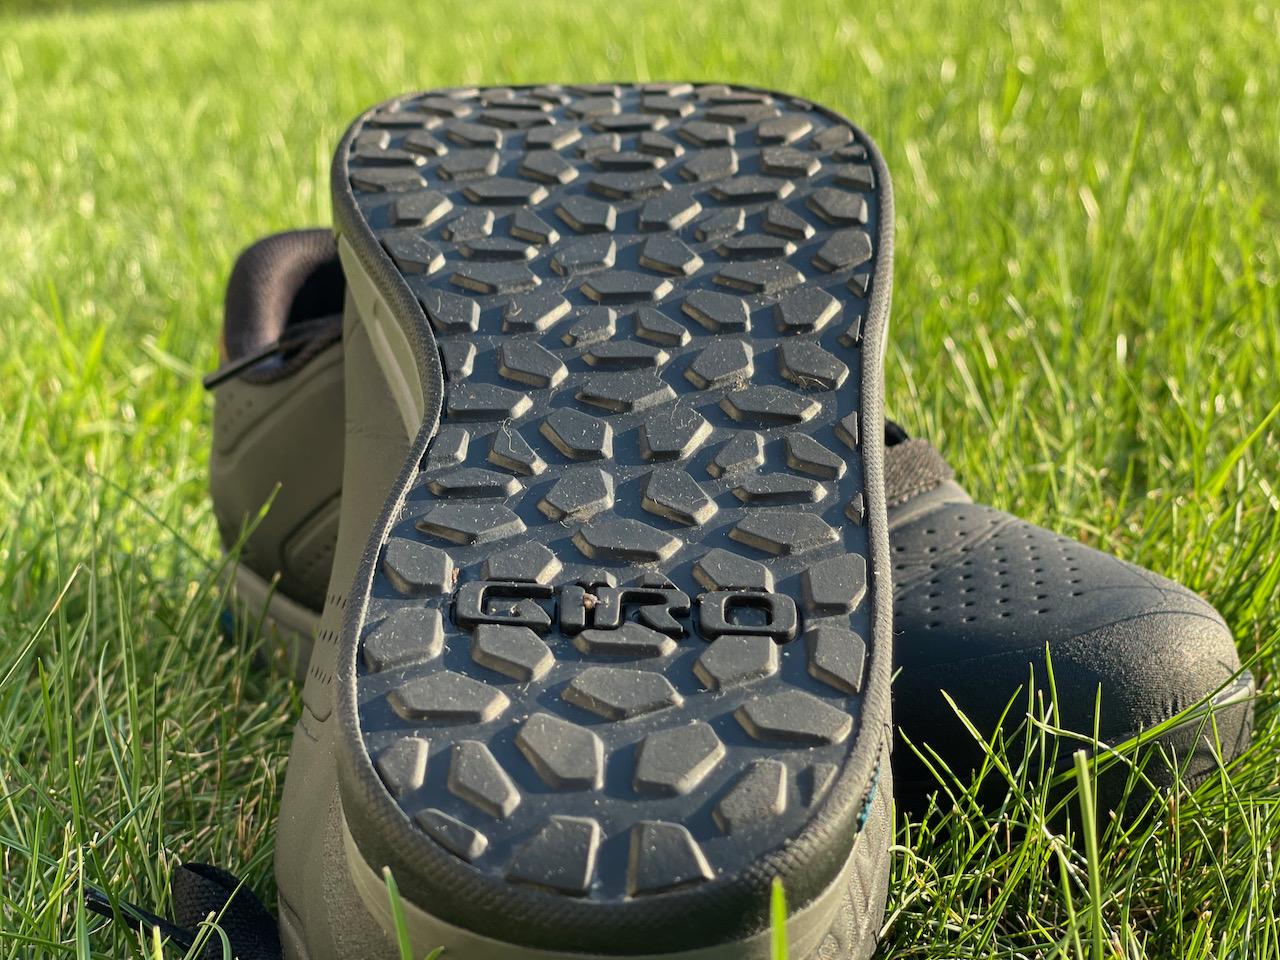 Giro Latch MTB shoes tread close up